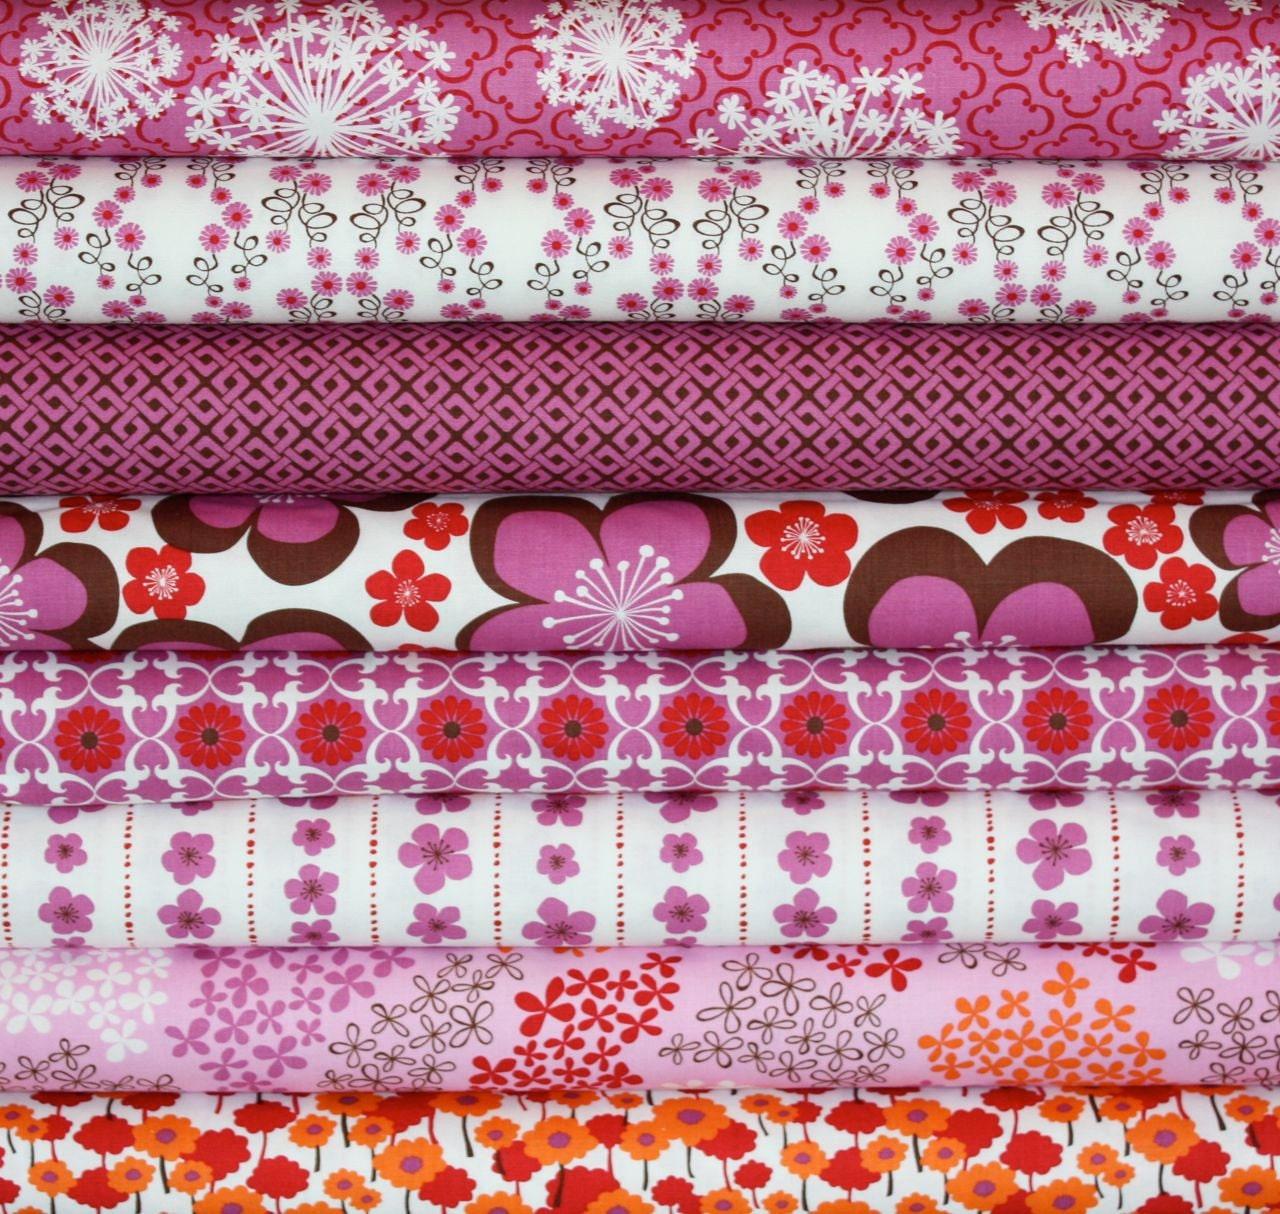 ORGANIC Pick a Bunch fabric by Nancy Mims for Robert Kaufman, 1/2 Yard Bundle- 8 total